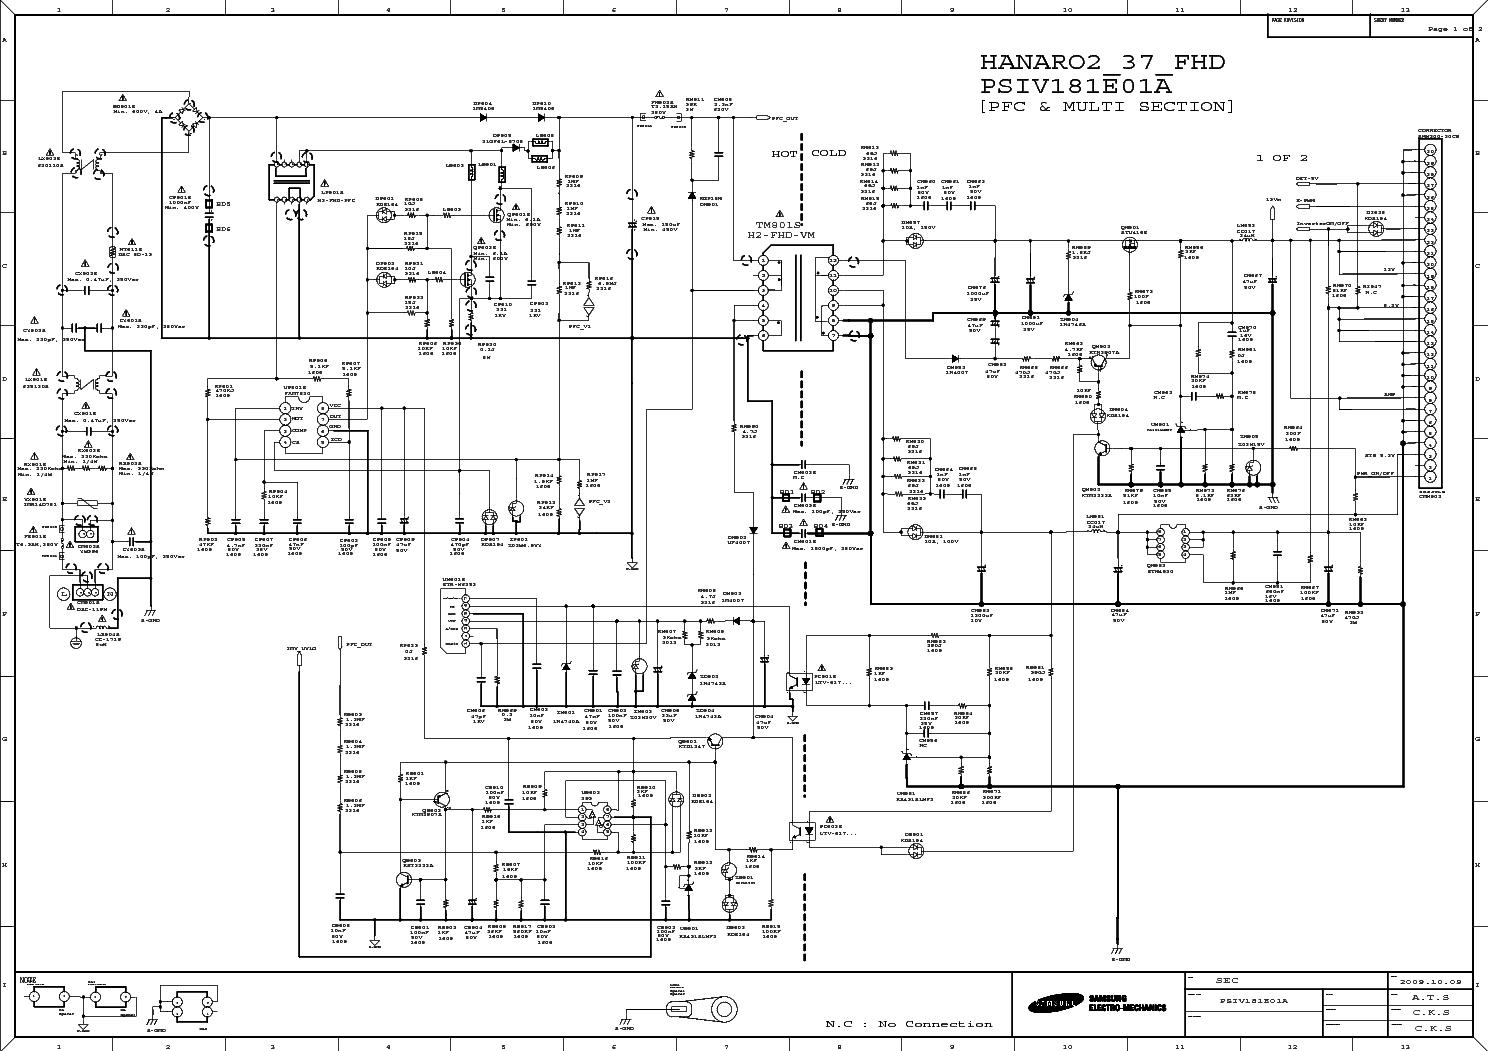 Samsung Service Manuals Diagrams Data Circuit Diagram Stereo Audio Amplifier 595x476 Lm386 Bn44 00262a Manual Download Schematics Eeprom Rh Elektrotanya Com User Schematic